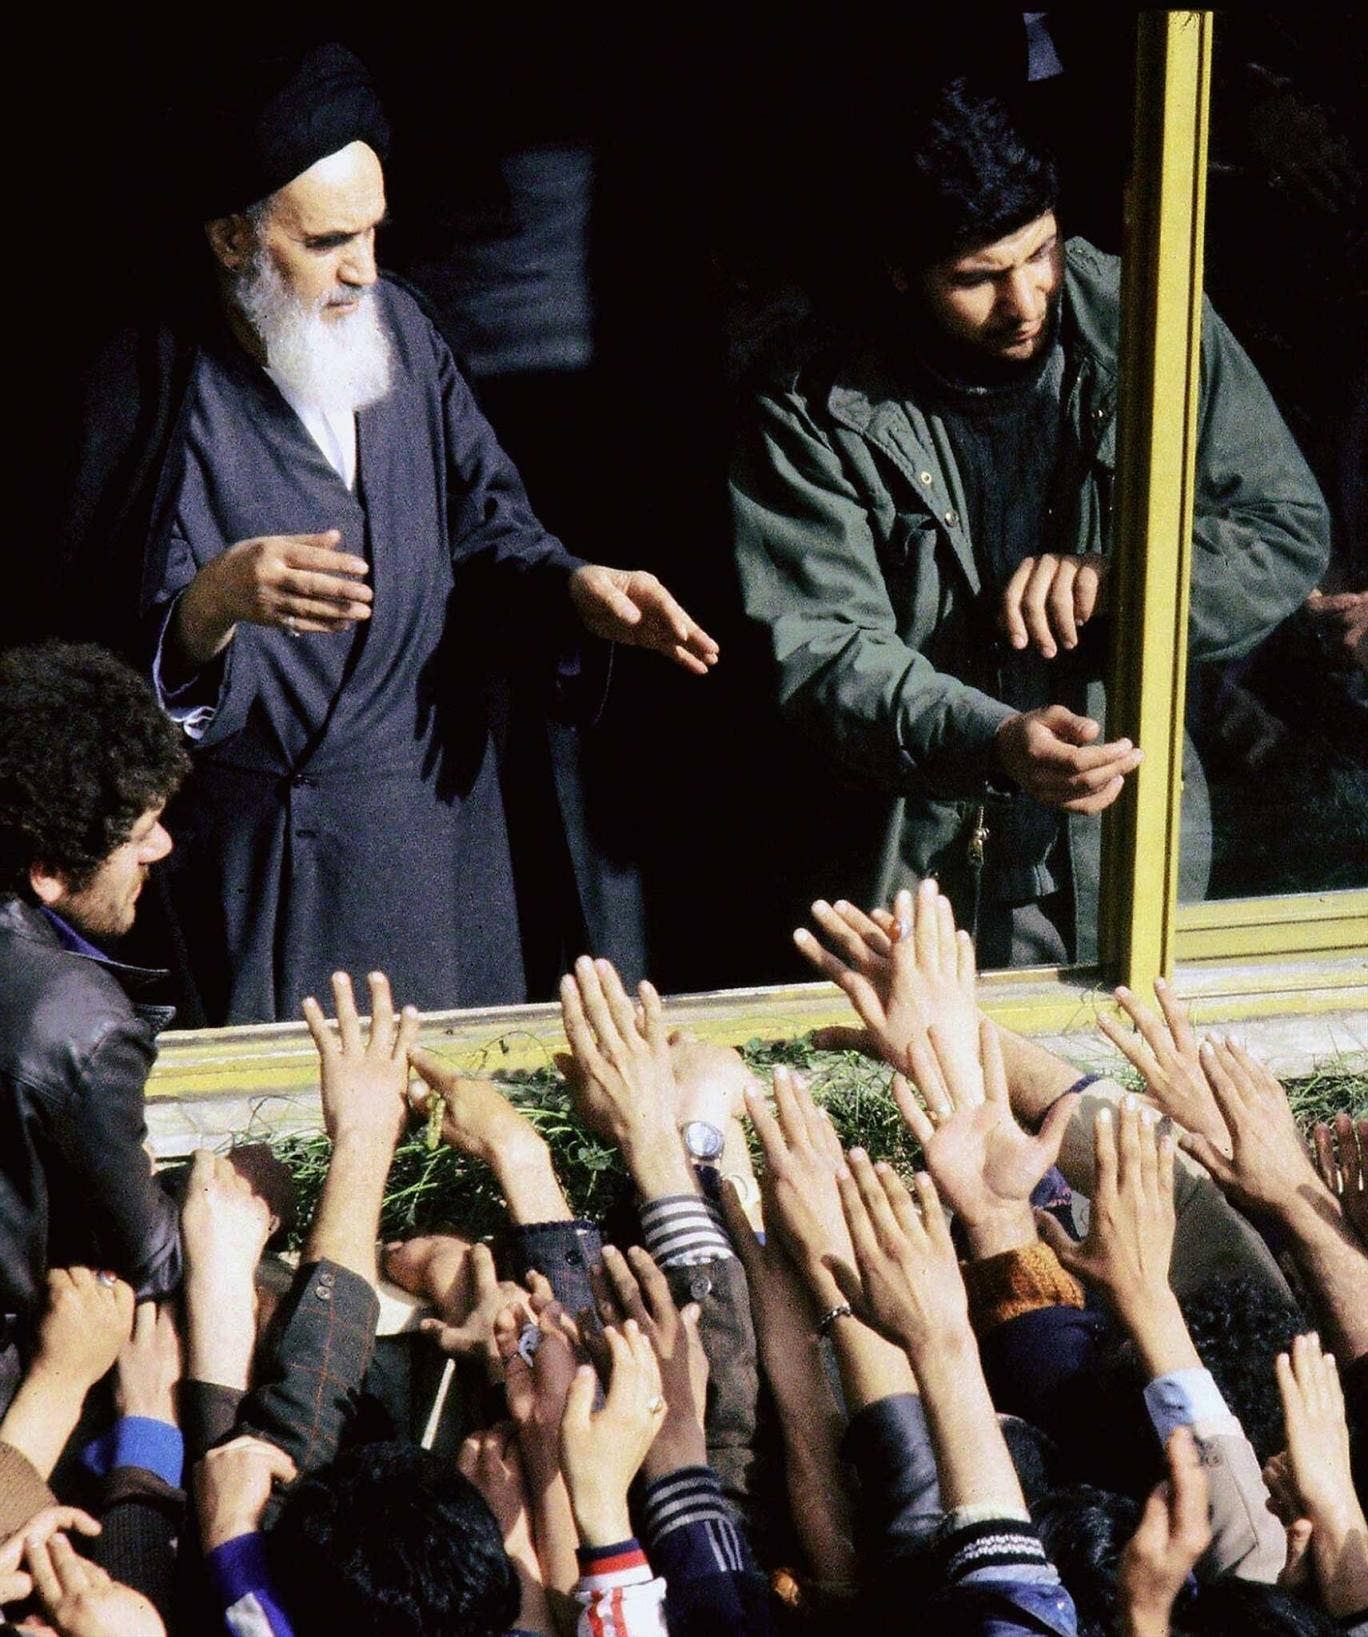 The saviour? Ayatollah Khomeini returns to Iran during the revolution of 1979